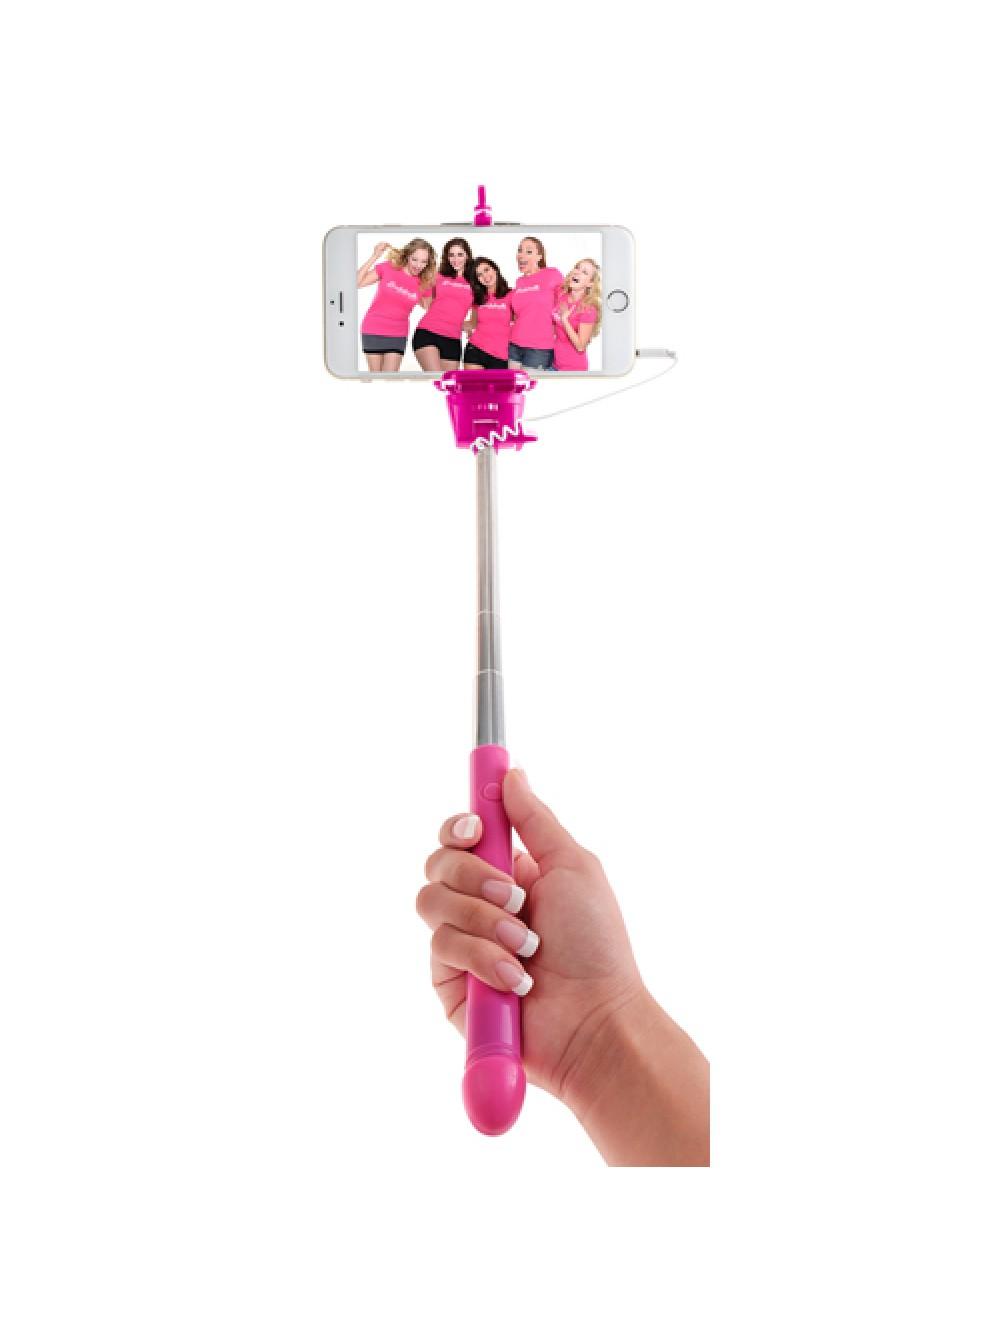 Pecker Selfie Stick 603912355680